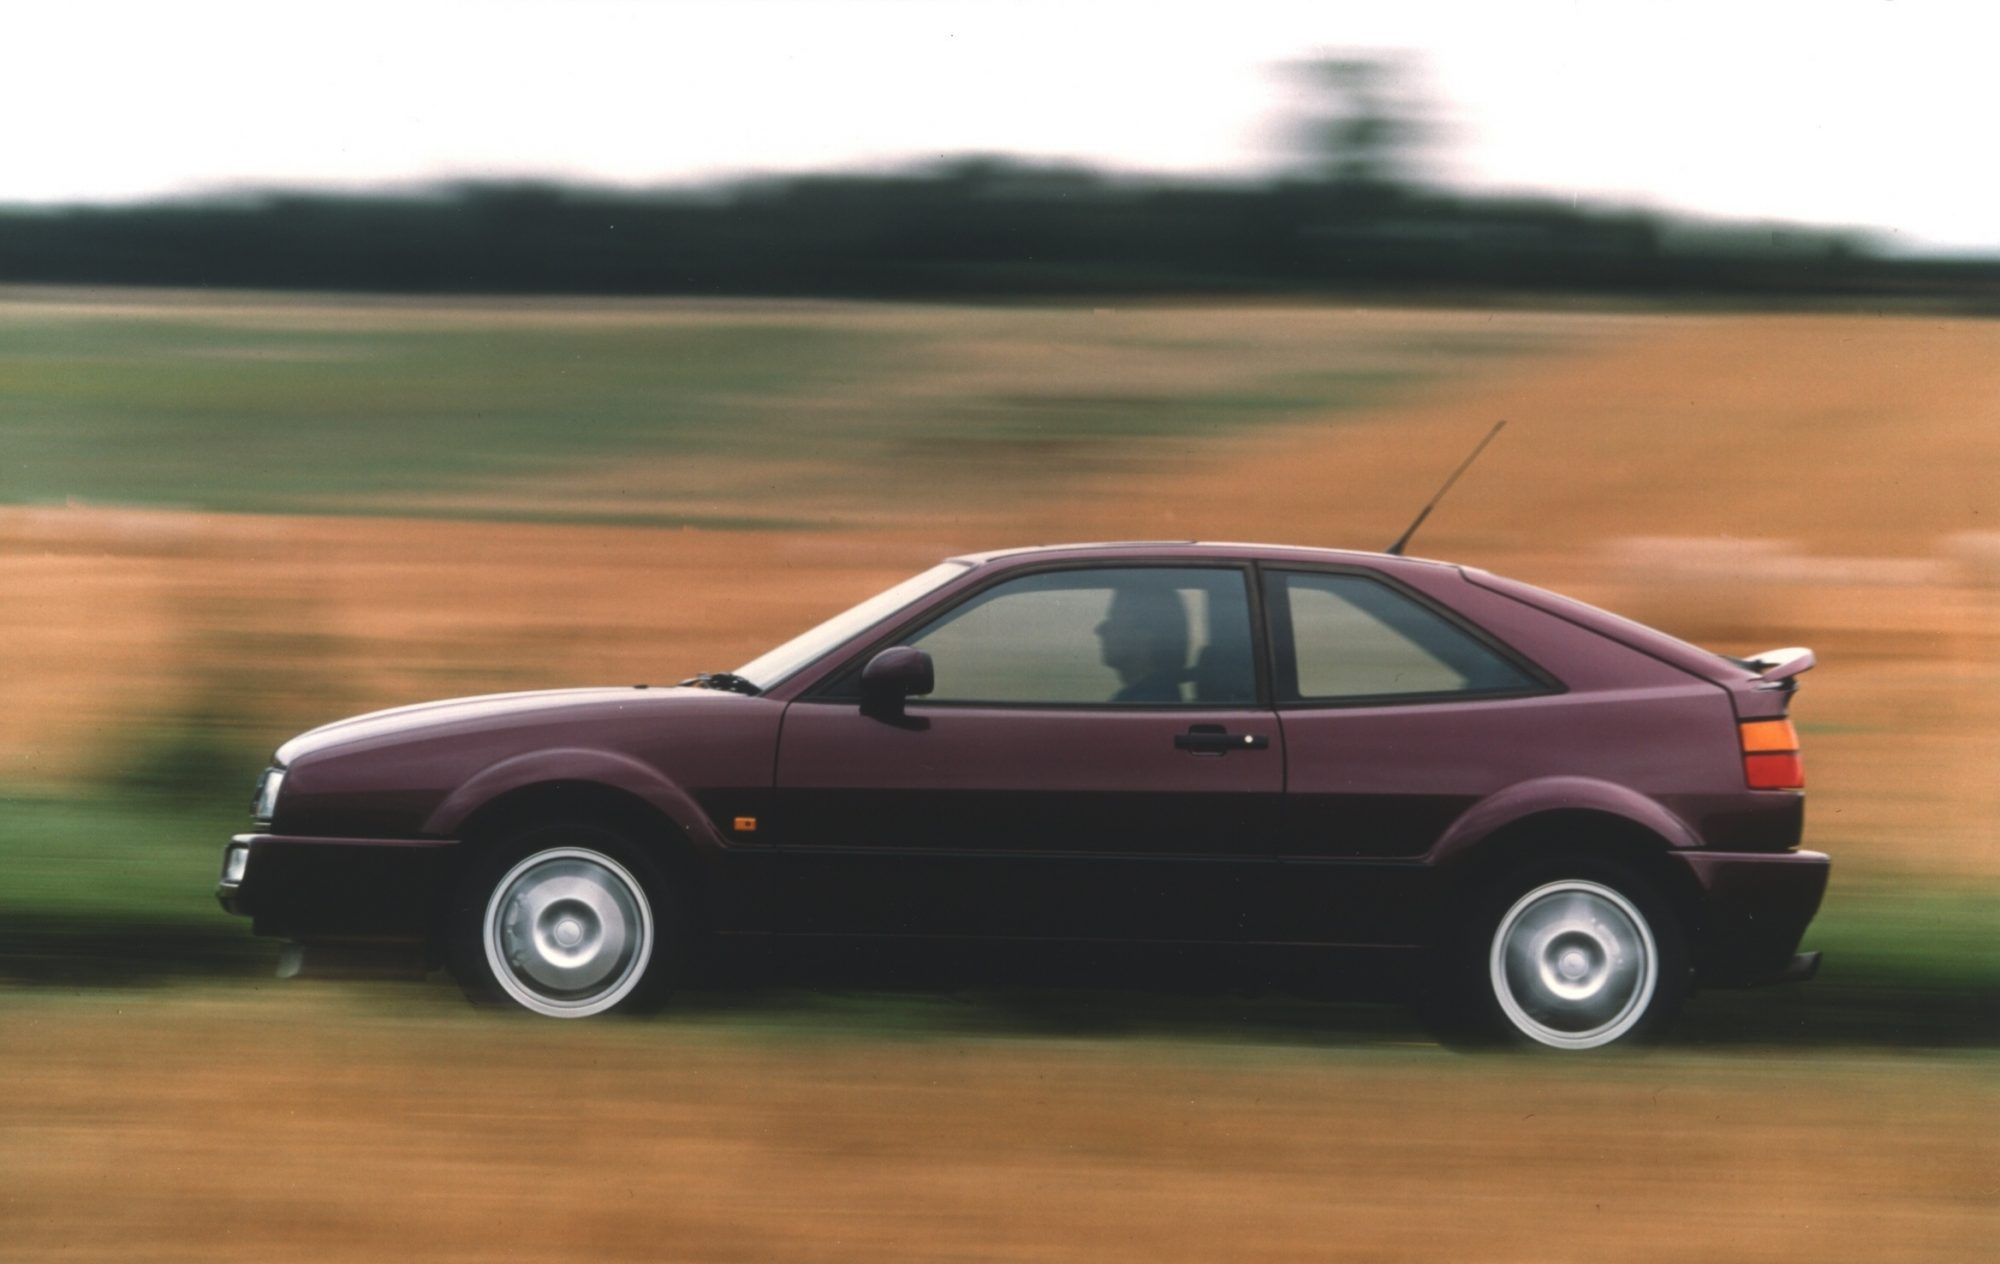 Volkswagen, Volkswagen Corrado. Corrado, Corrado VR6, Corrado G60, VR6, G60,. VW G60, classic car, retro car, motoring, automotive, carandclassic, carandclassic.co.uk